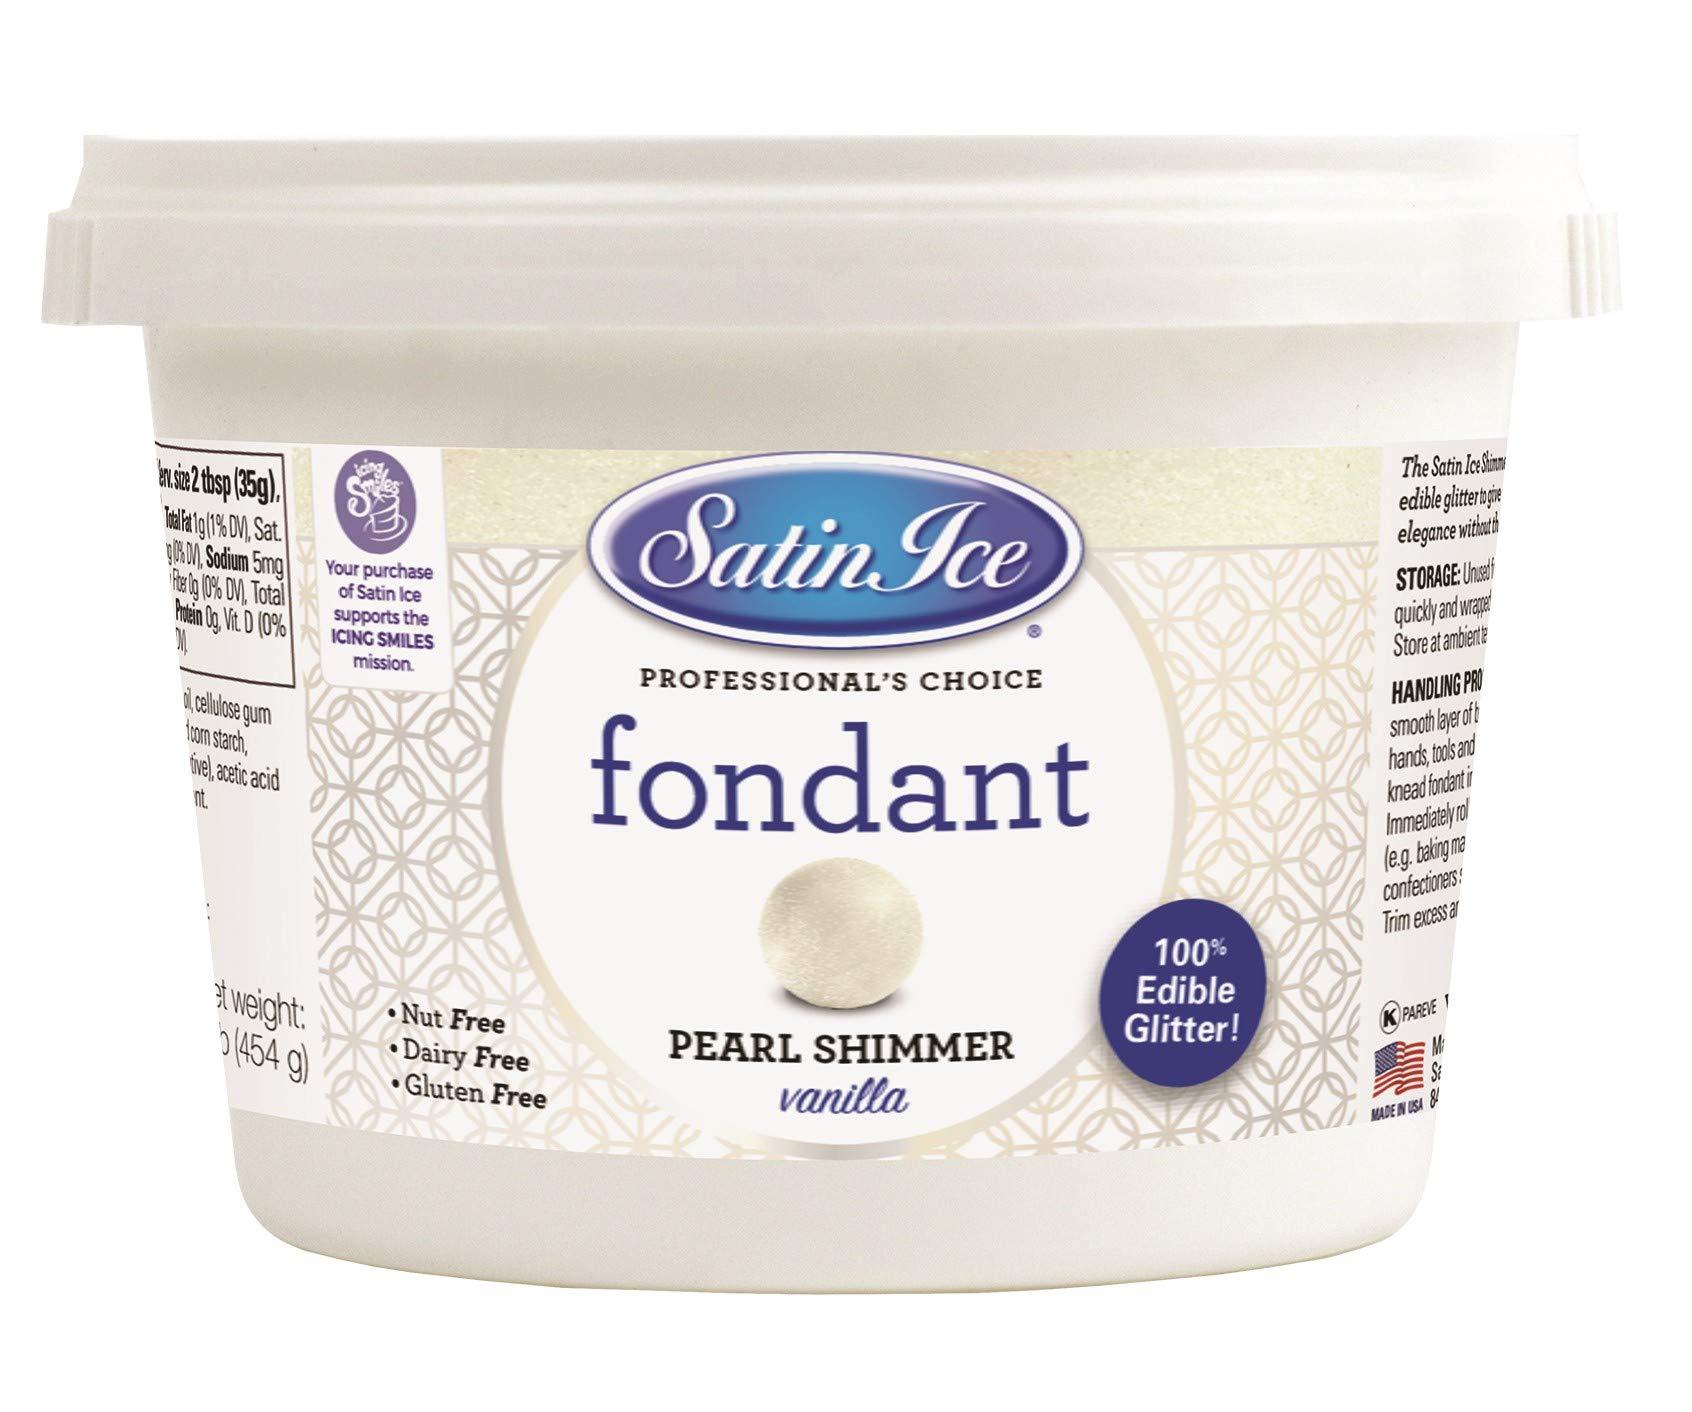 Satin Ice Pearl Shimmer Fondant, Vanilla, 1 Pounds